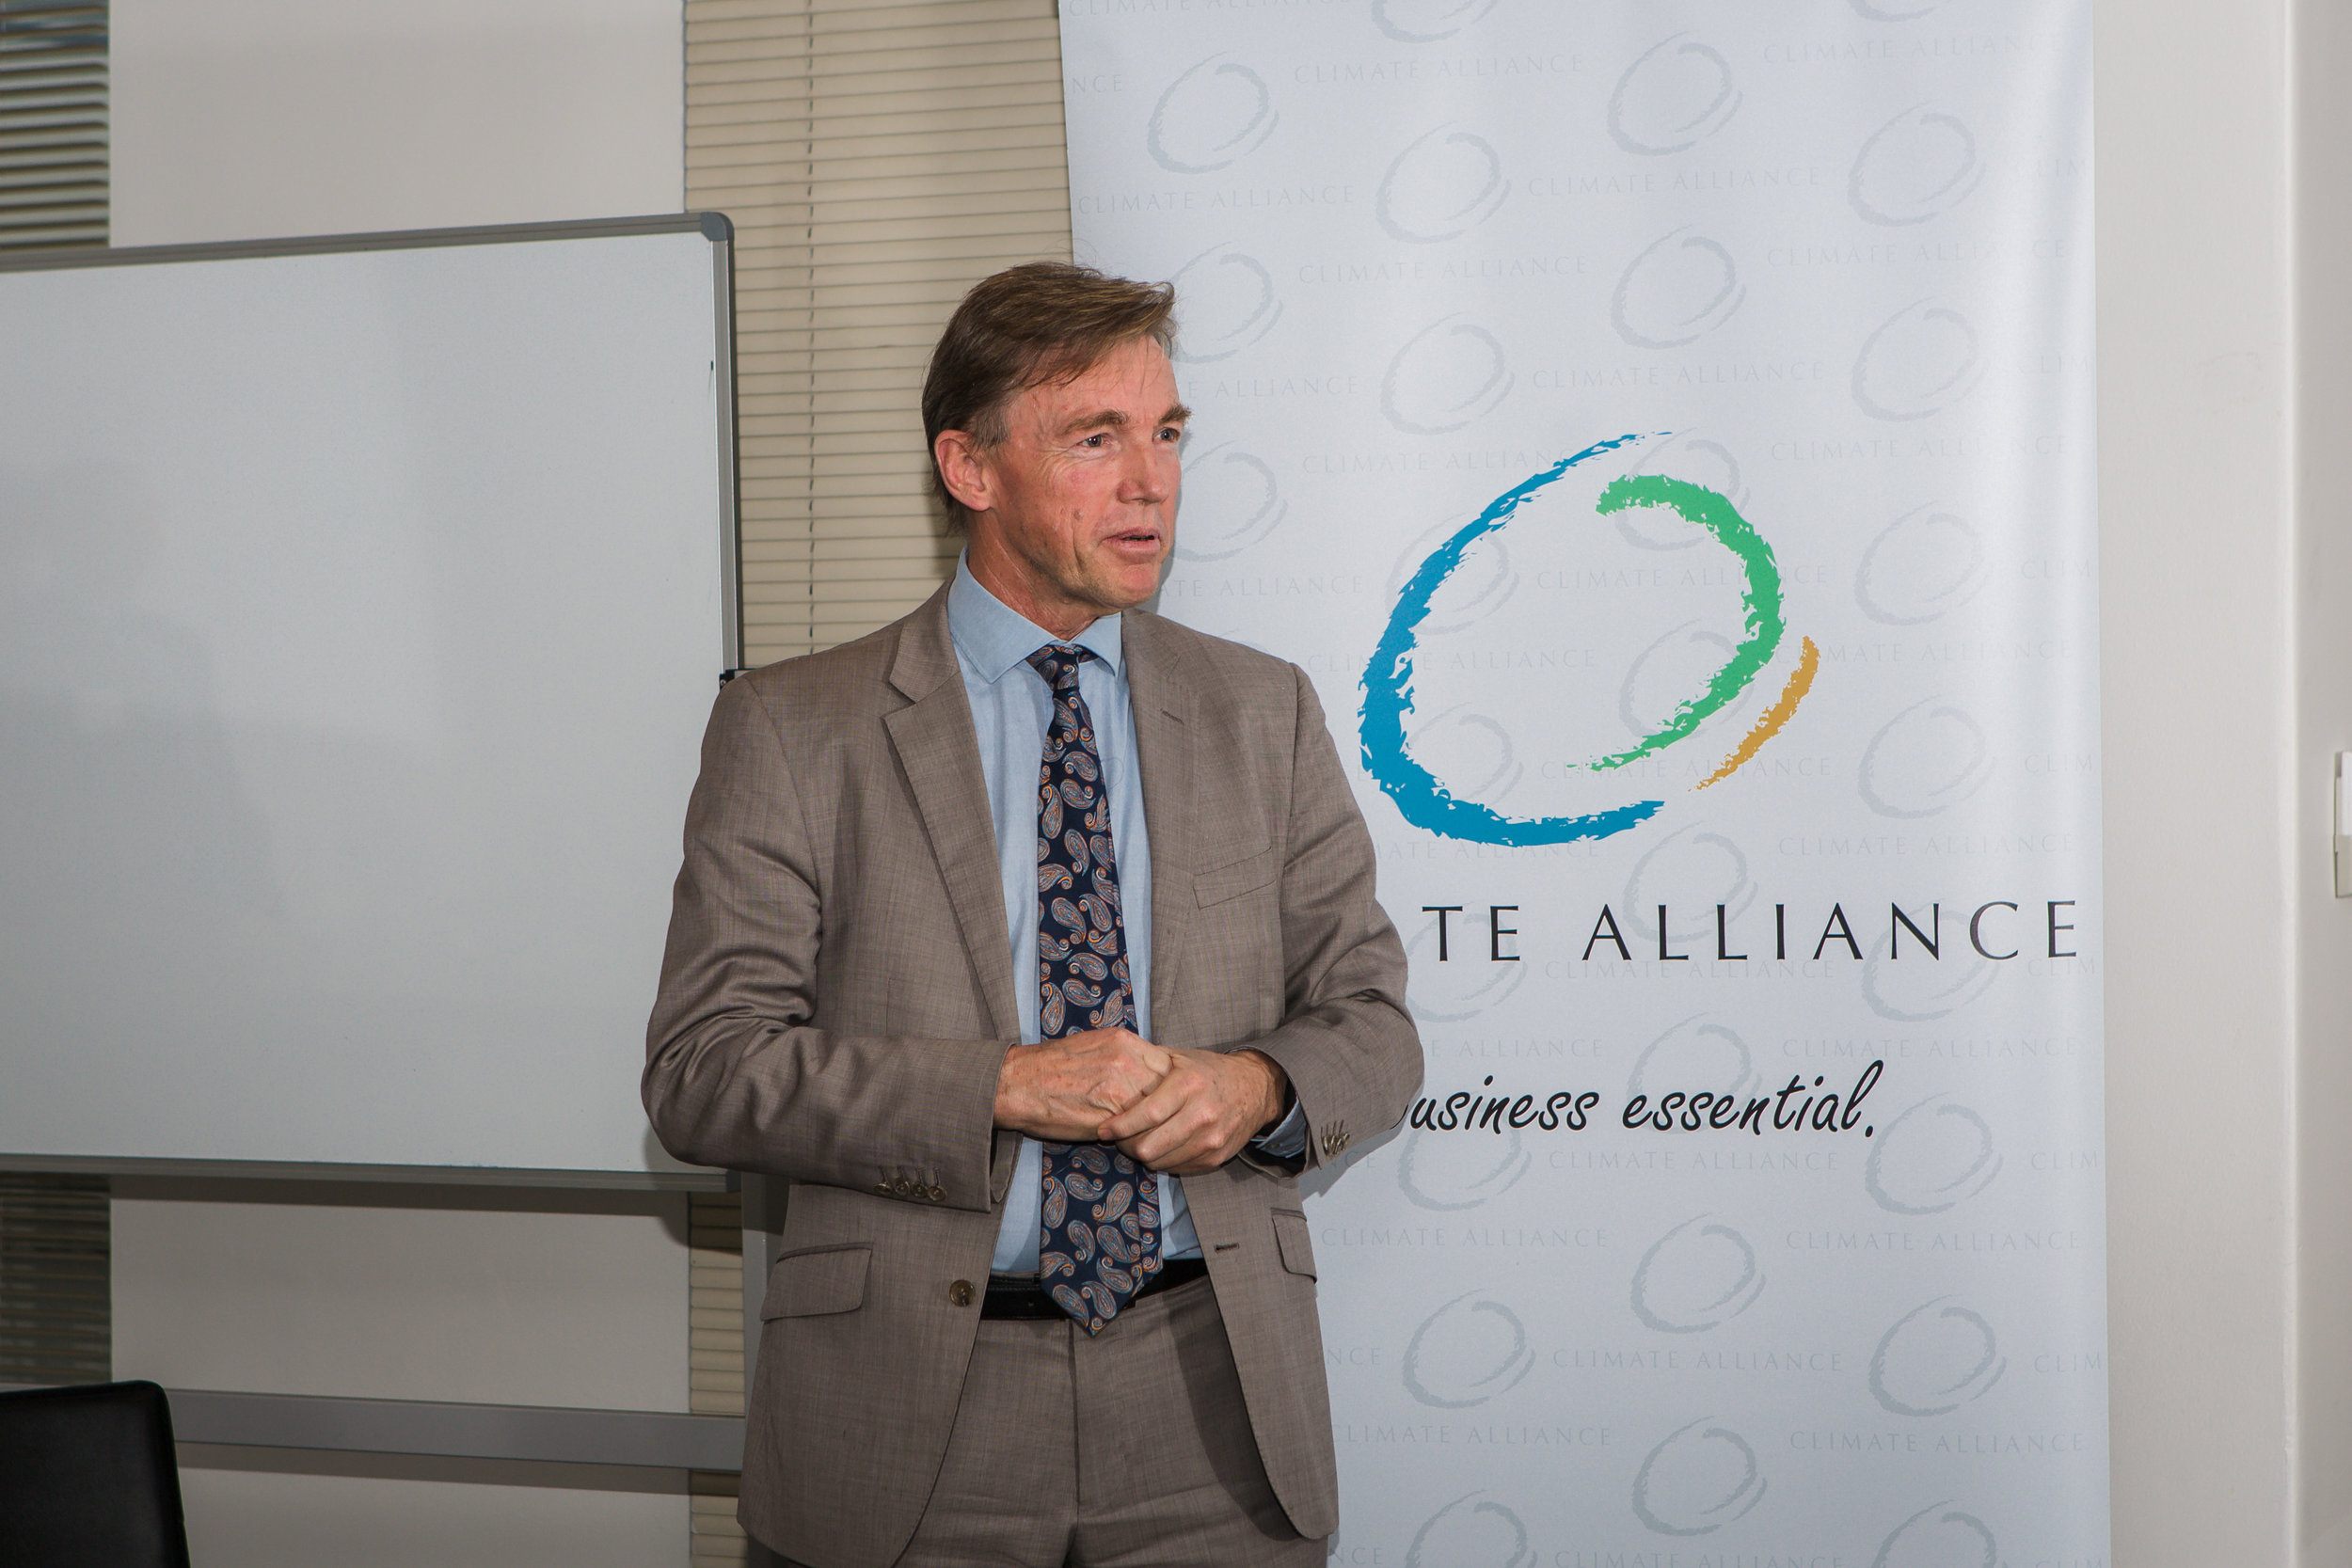 Professor John Thwaites